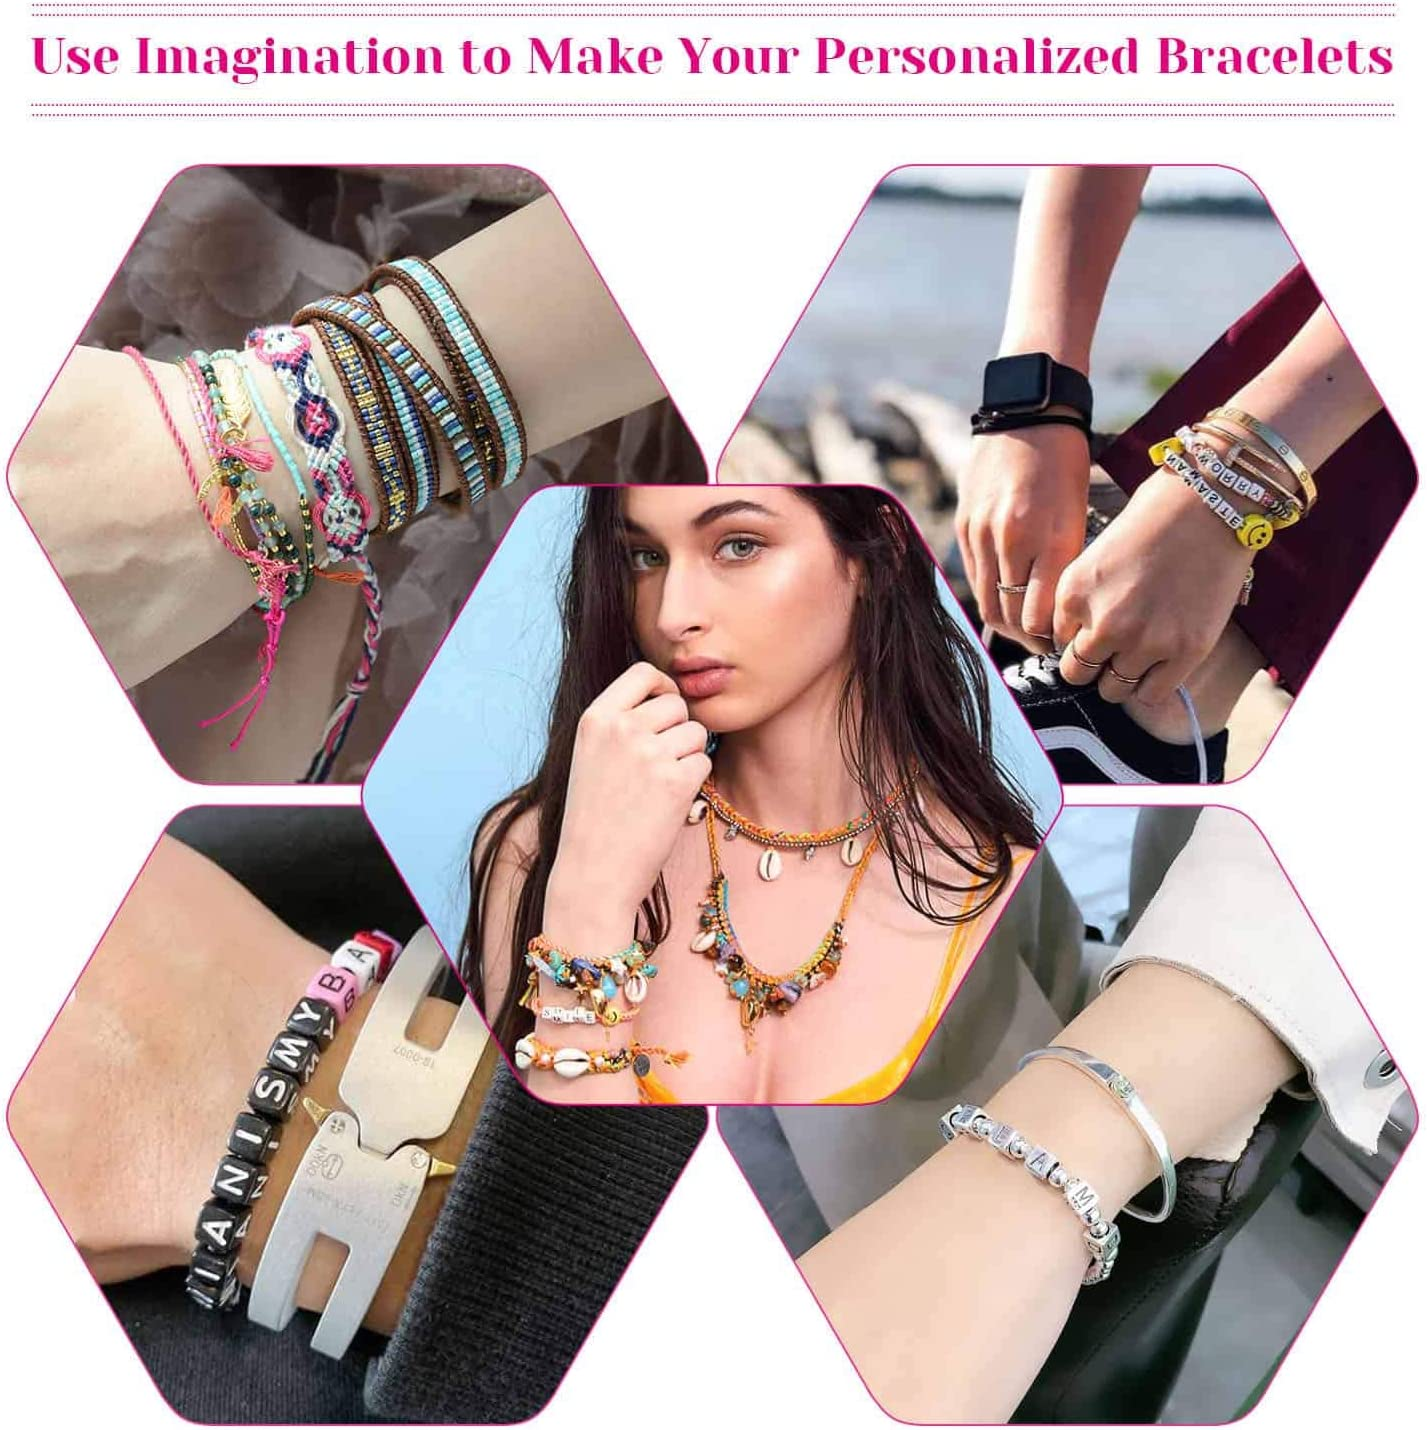 Paxcoo Bead Bracelet Making kit with 50 Colors Friendship Bracelet String Bracelet Letter Beads and Charms for Friendship Bracelets and Jewelry Making